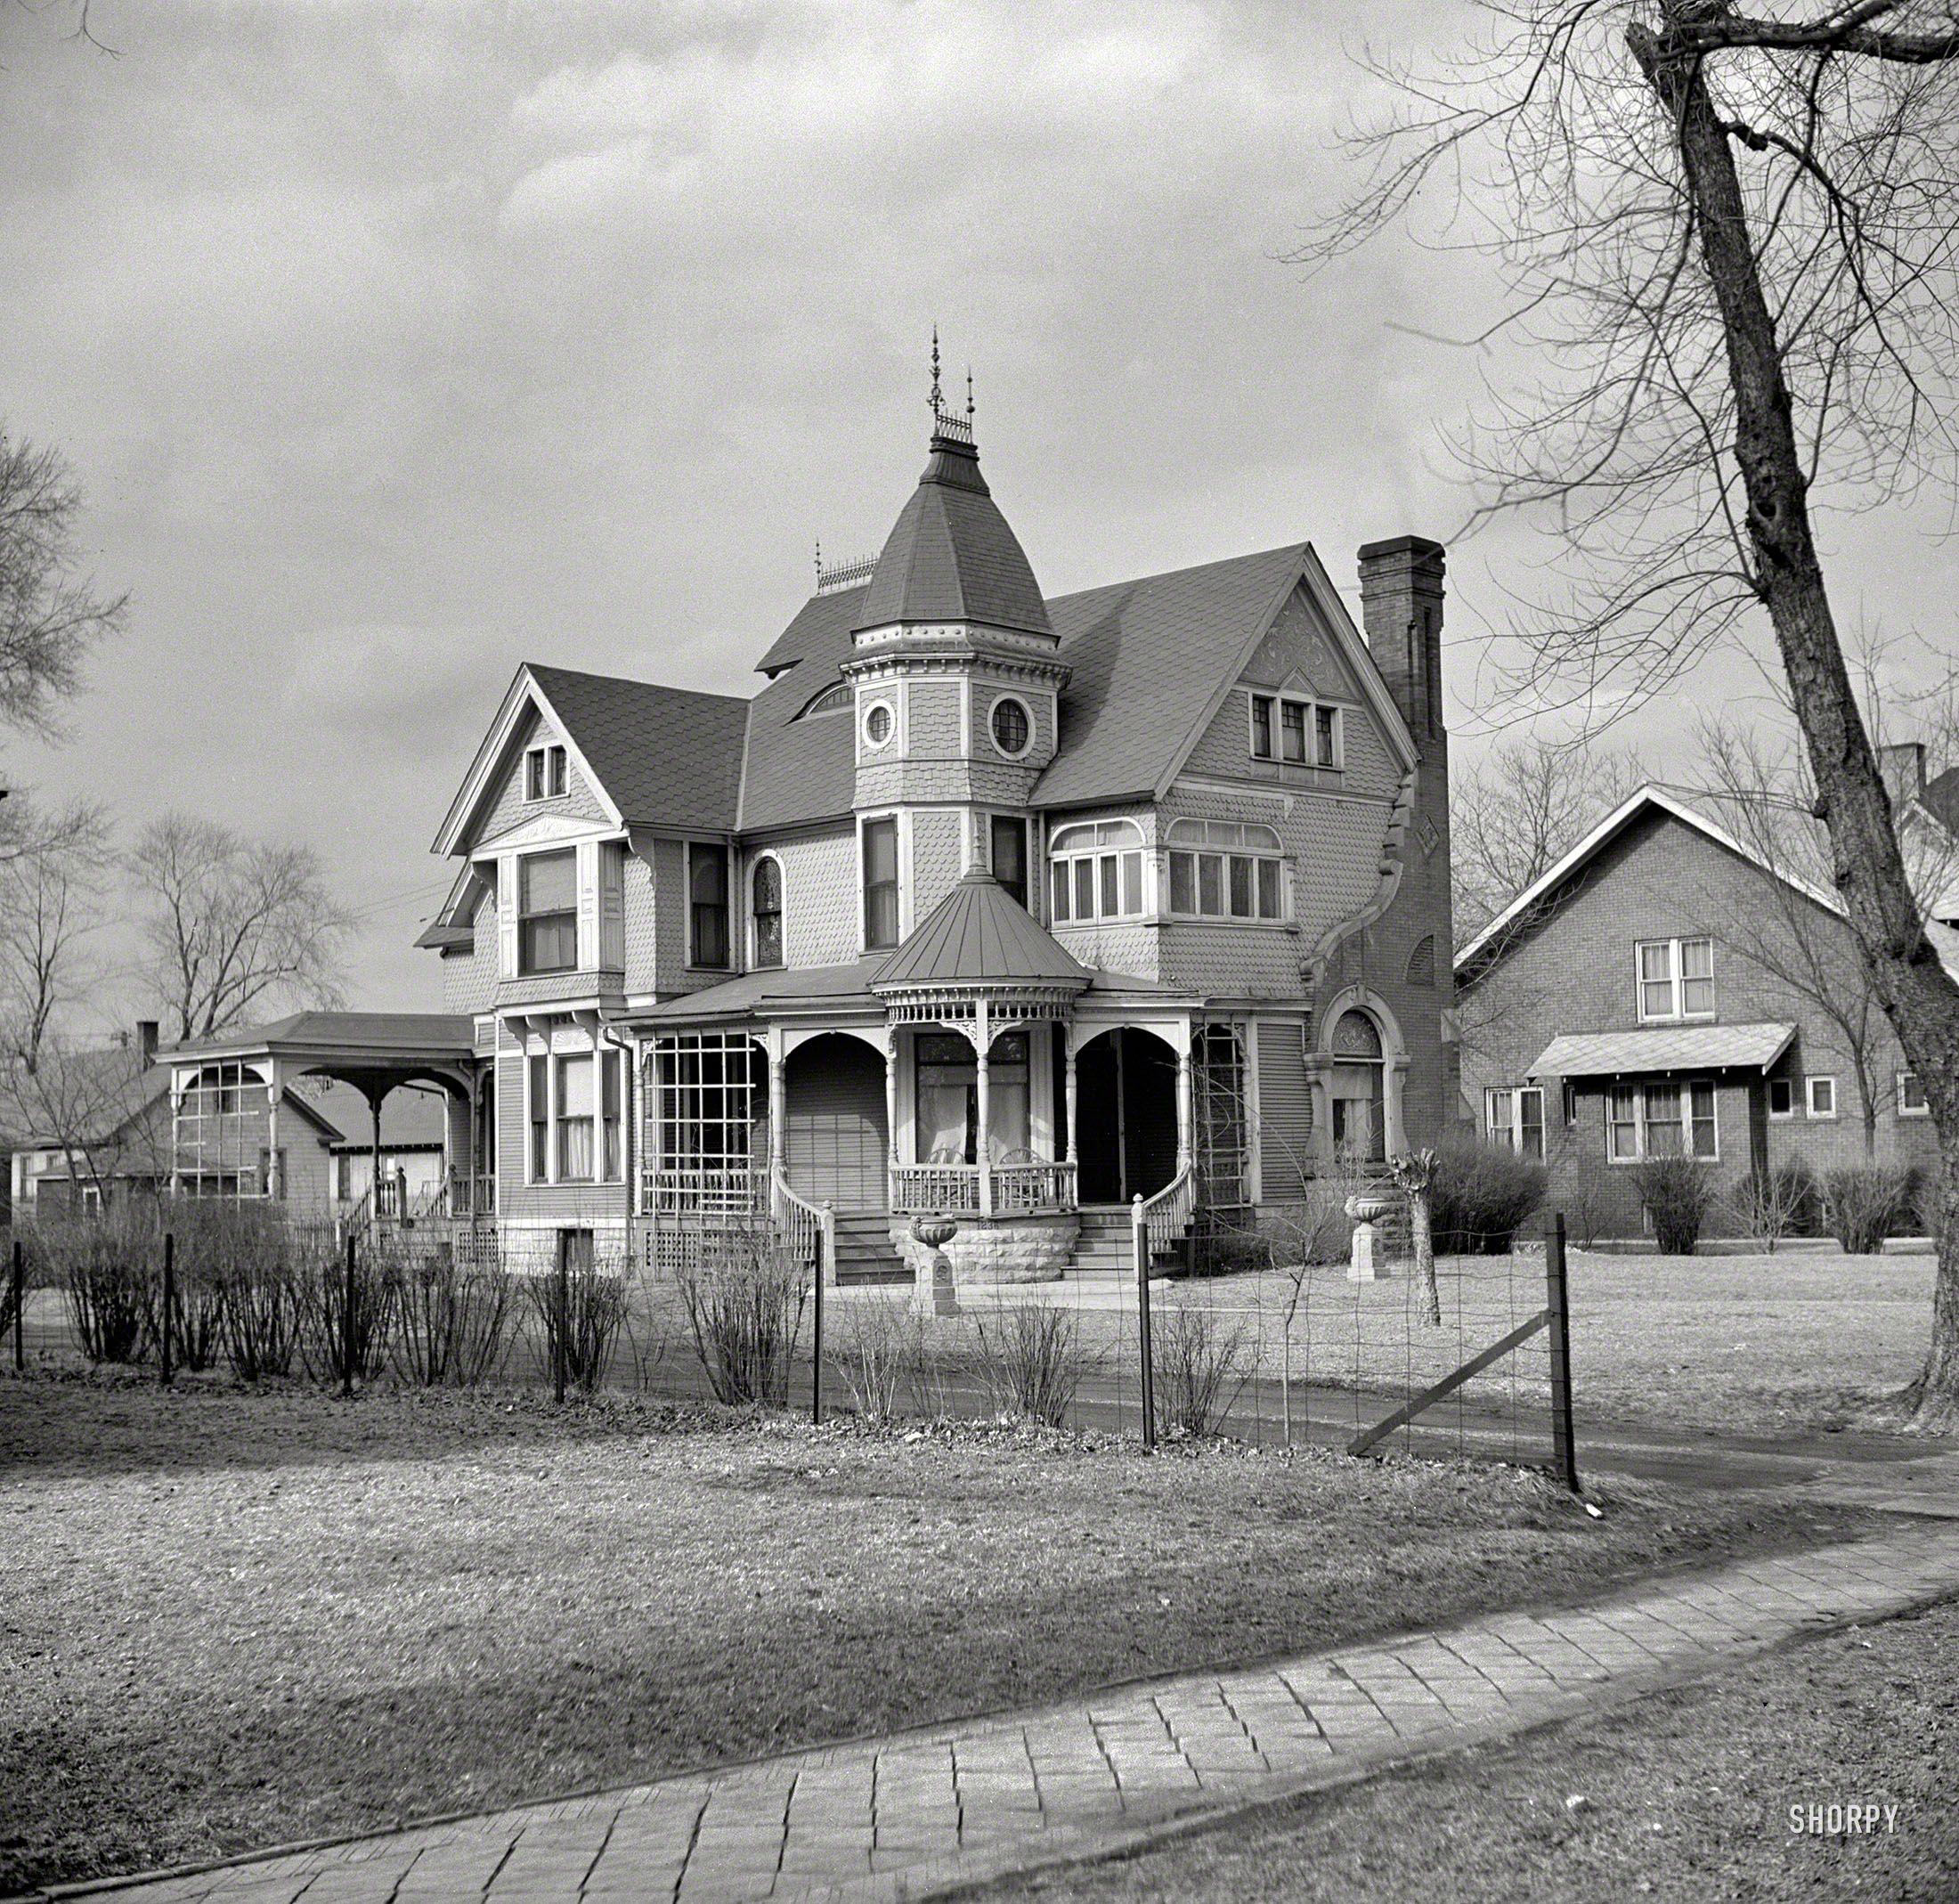 ceci est une photographie d 39 avril 1937 de la maison 1236 ottawa ave ottawa l 39 illinois. Black Bedroom Furniture Sets. Home Design Ideas